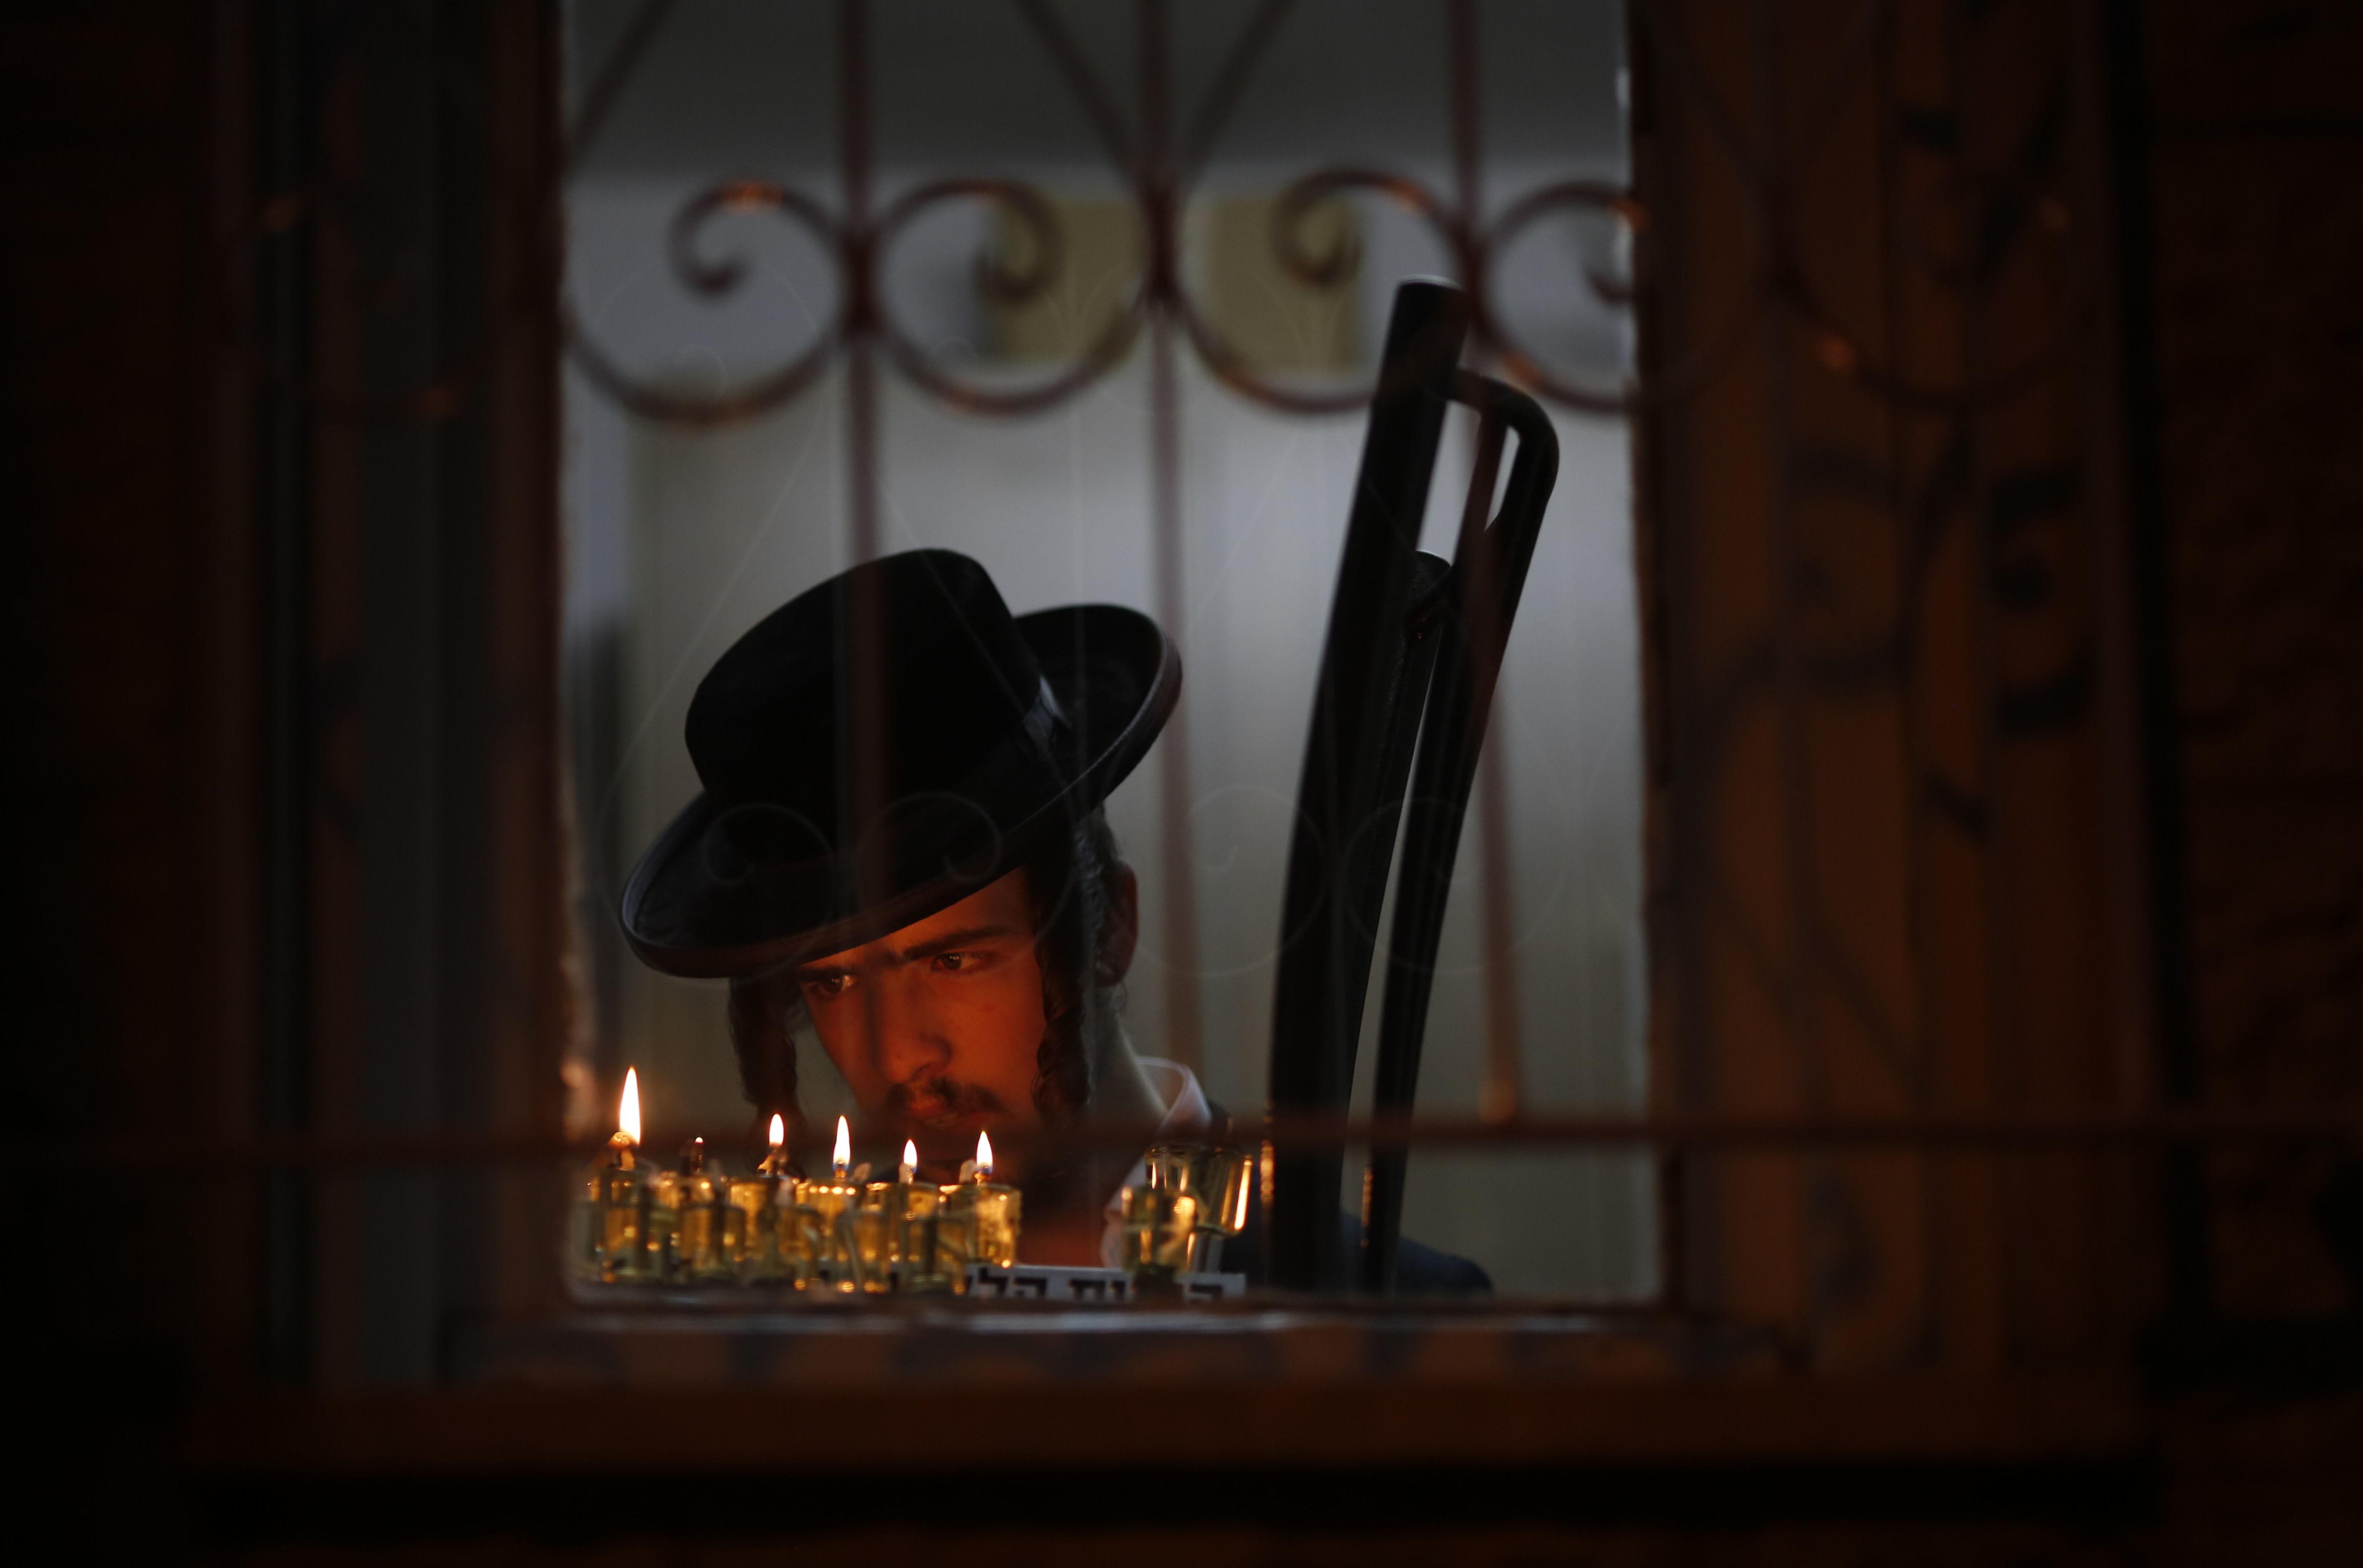 An ultra-Orthodox Jewish man lights candles during the Jewish holiday of Hanukkah in Jerusalem's Mea Shearim neighborhood in Jerusalem, Sunday, Dec. 17, 2017